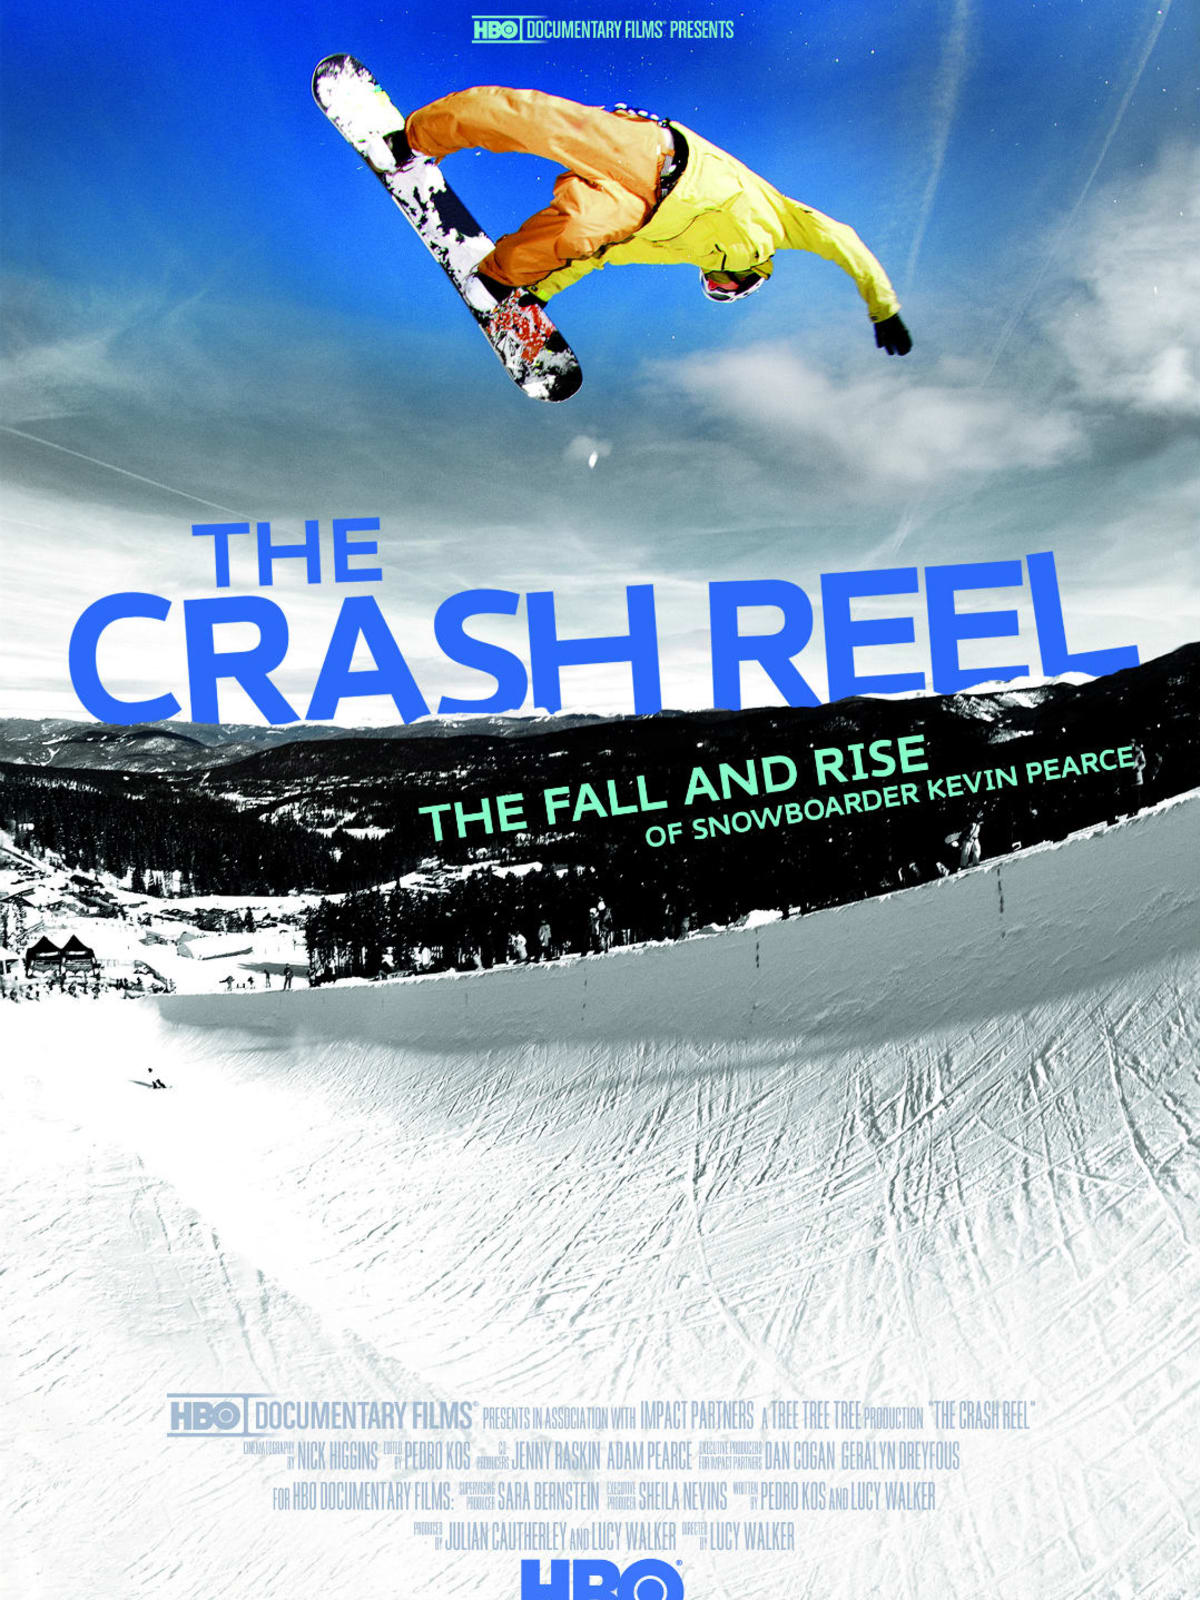 Dallas International Film Festival, The Crash Reel